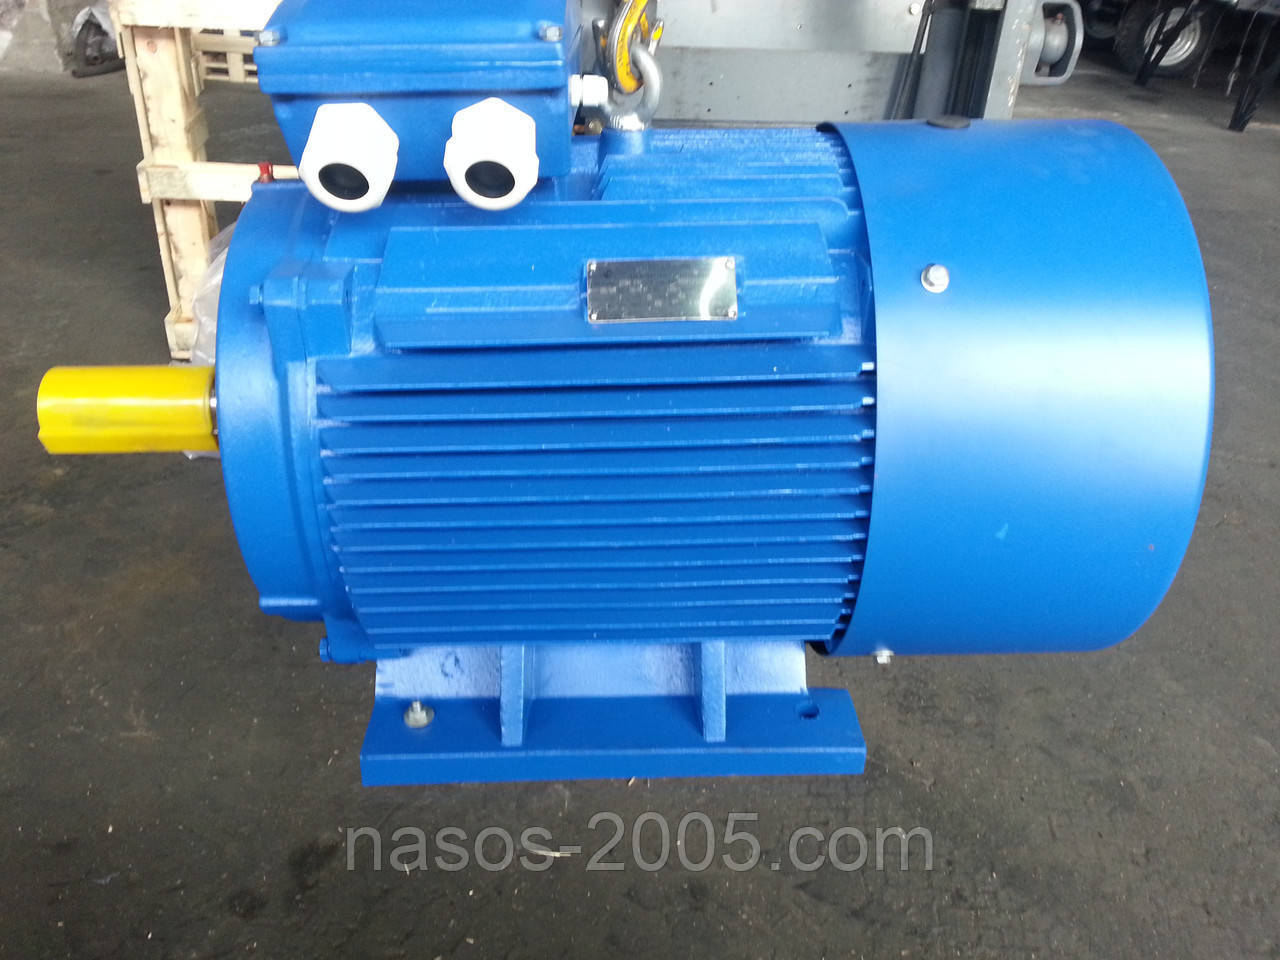 Электродвигатель АИР 80 A8 0,37кВт 750 об/мин